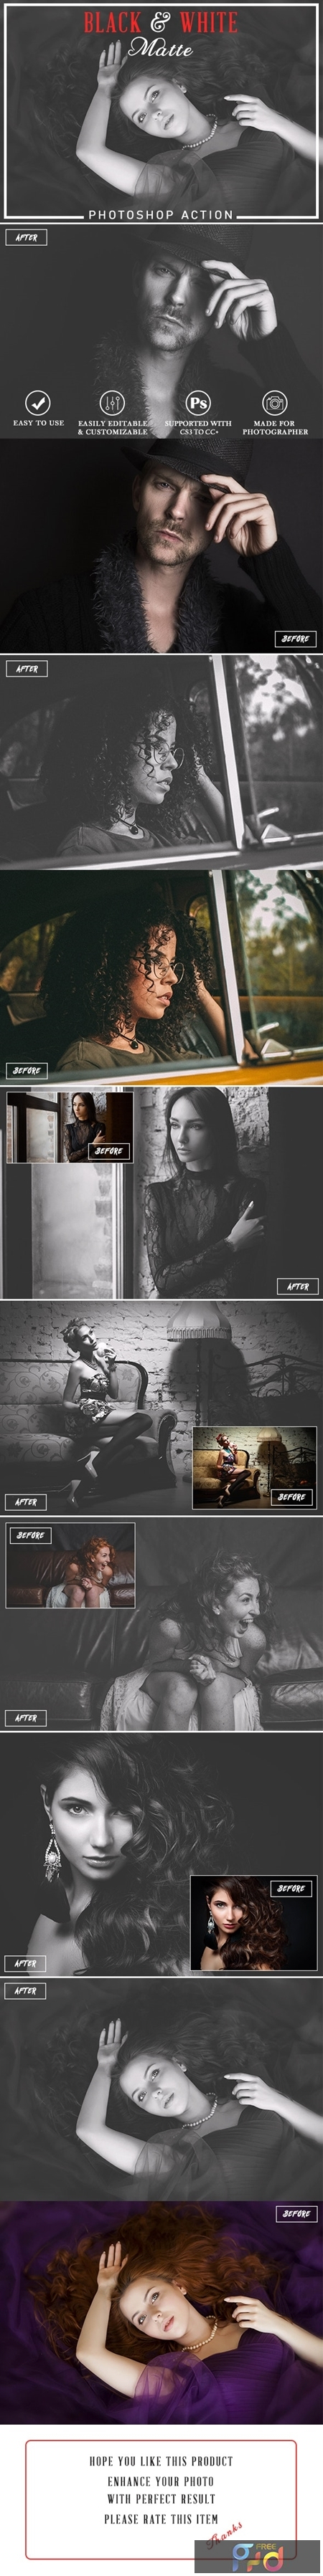 Black & White Matte Photoshop Action 24958508 1